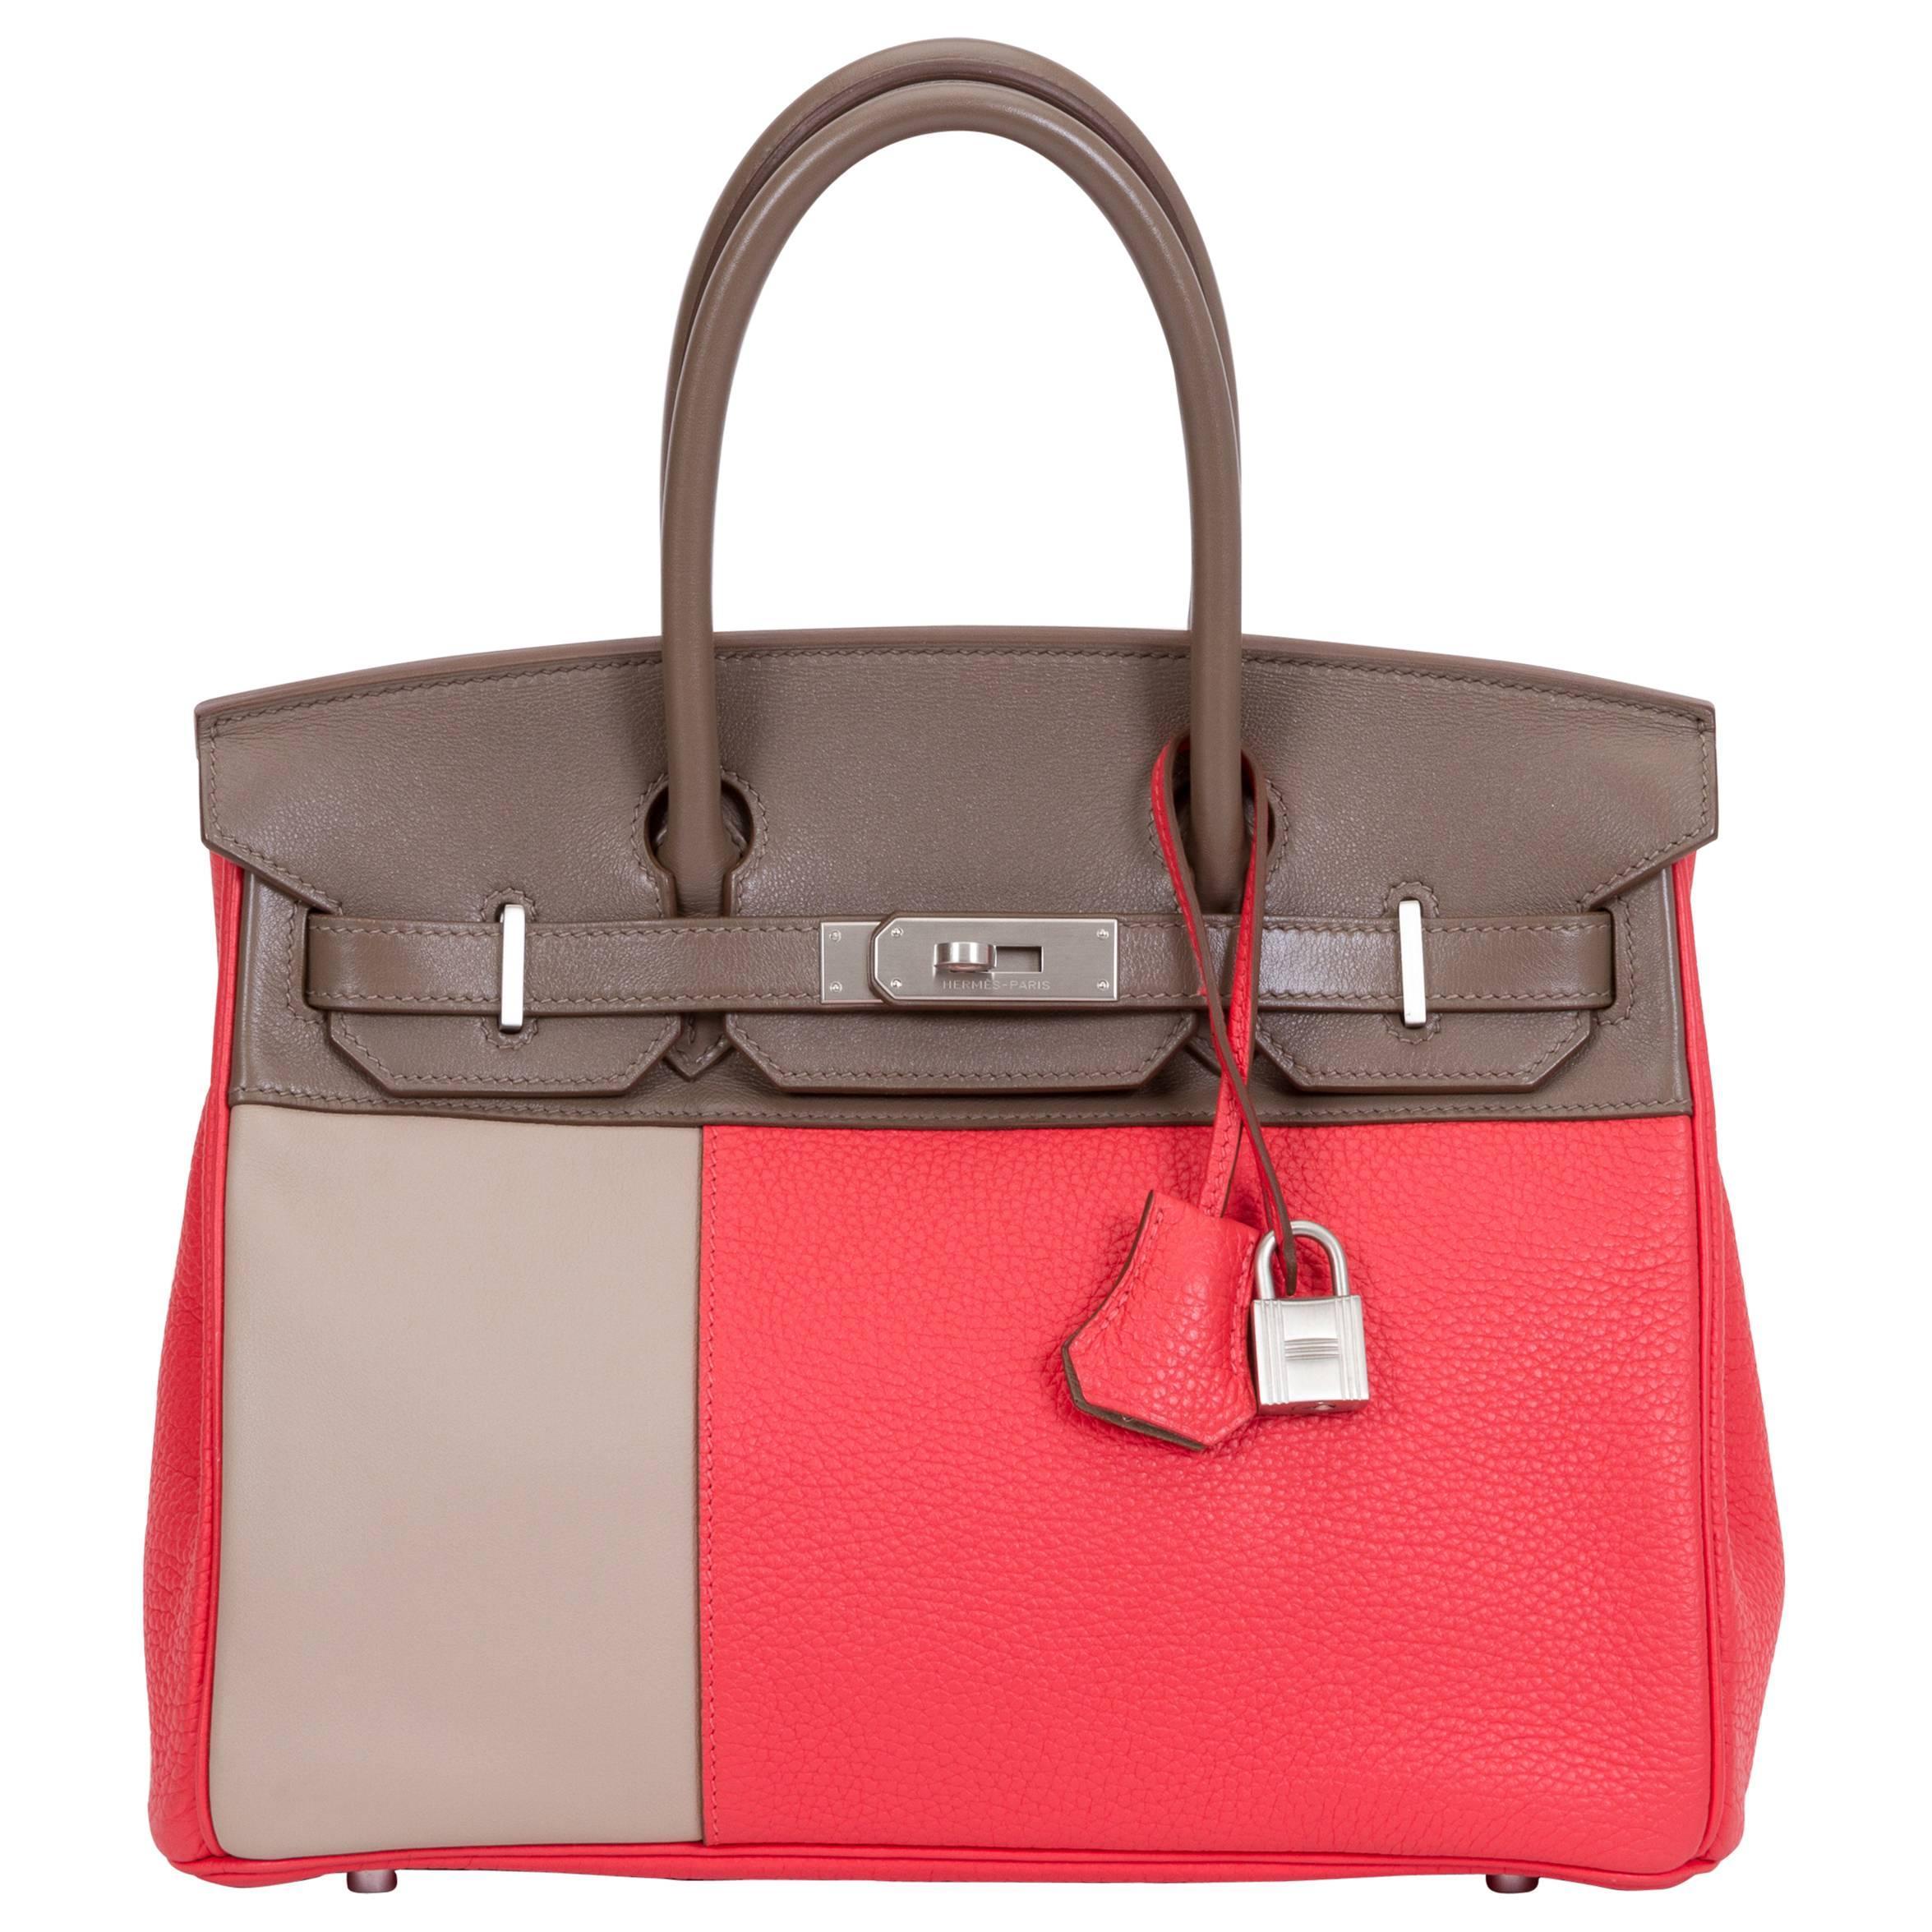 Hermès Limited Edition Birkin 30cm Tricolor Bag